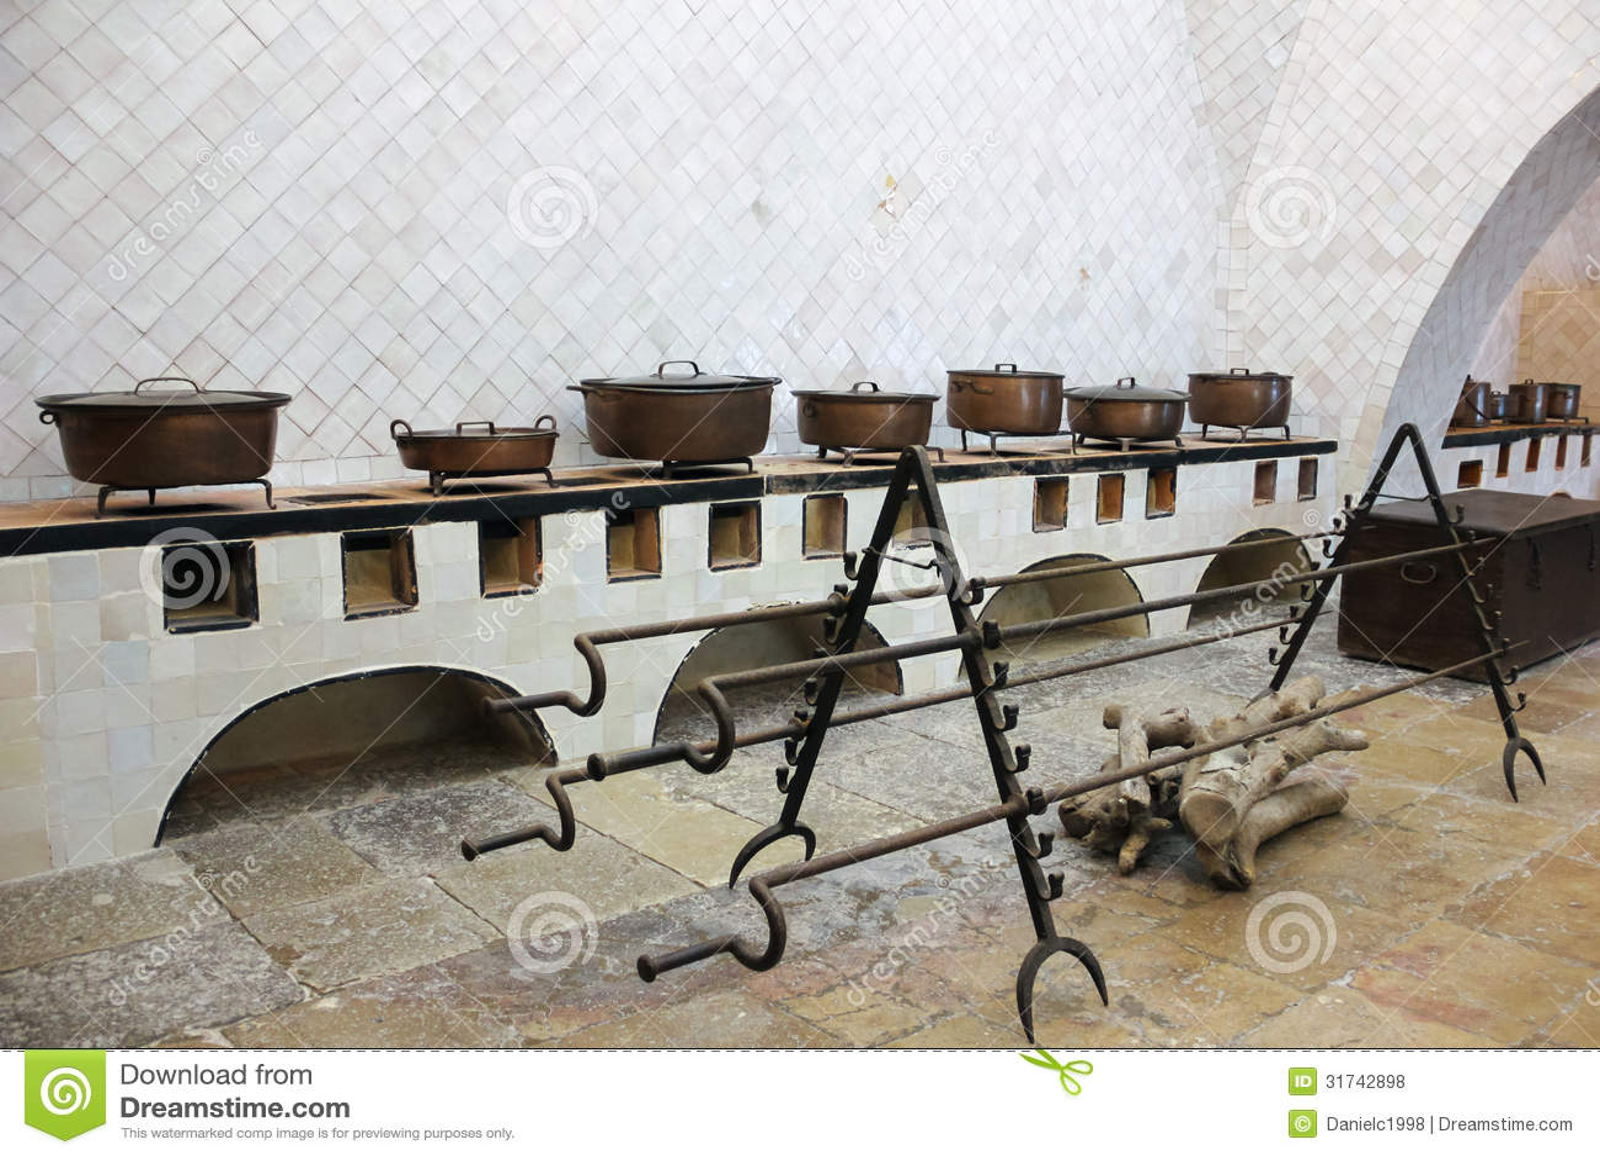 Kok Lantligt Bilder : kok lantligt bilder  Lantligt kok Rad av gamla kopparpannor Sintra